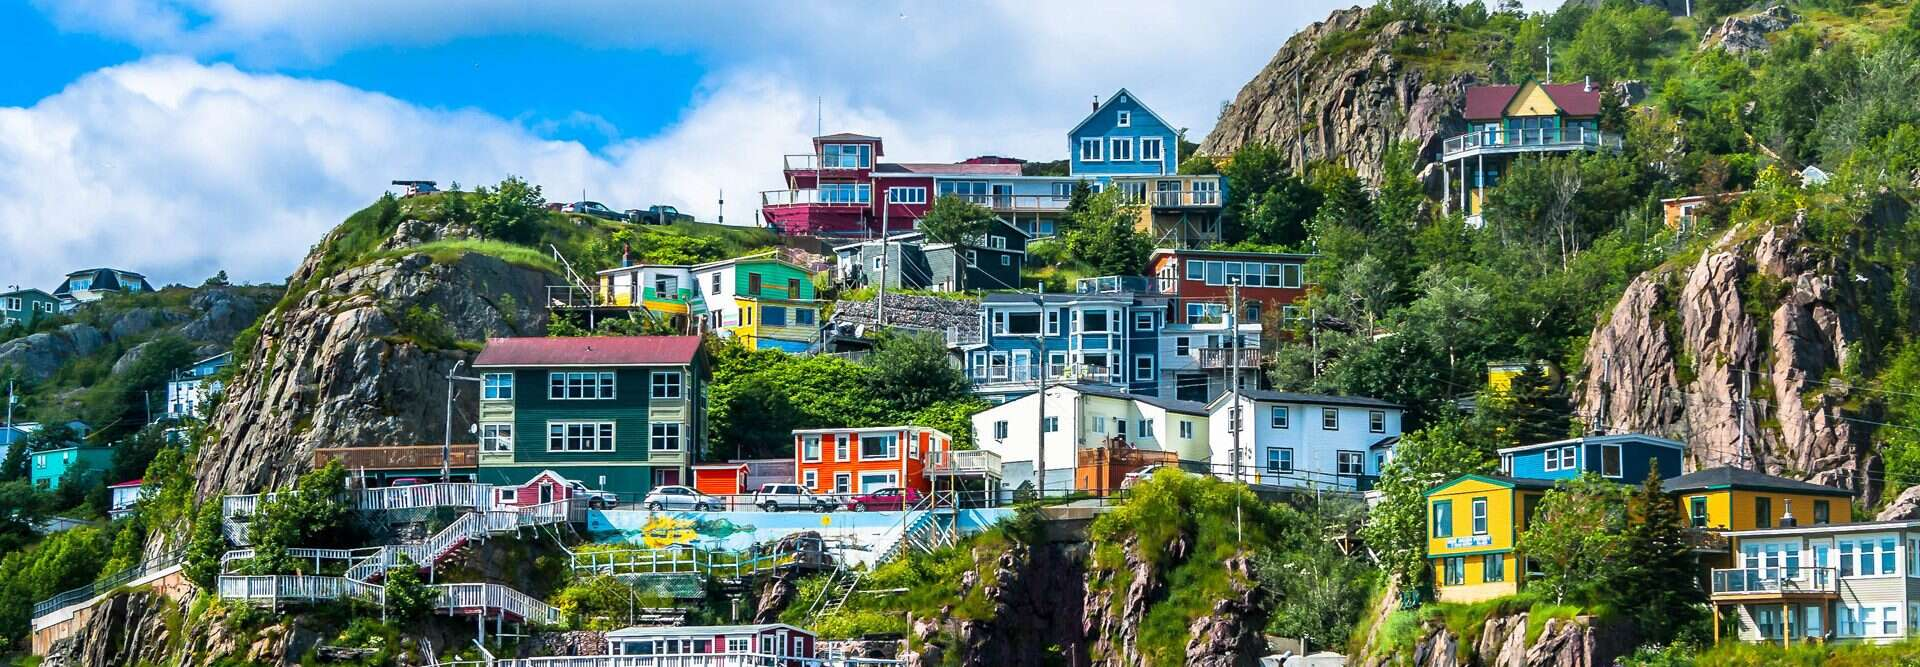 Newfoundland & Labrador Viking Trail - Summer 2021